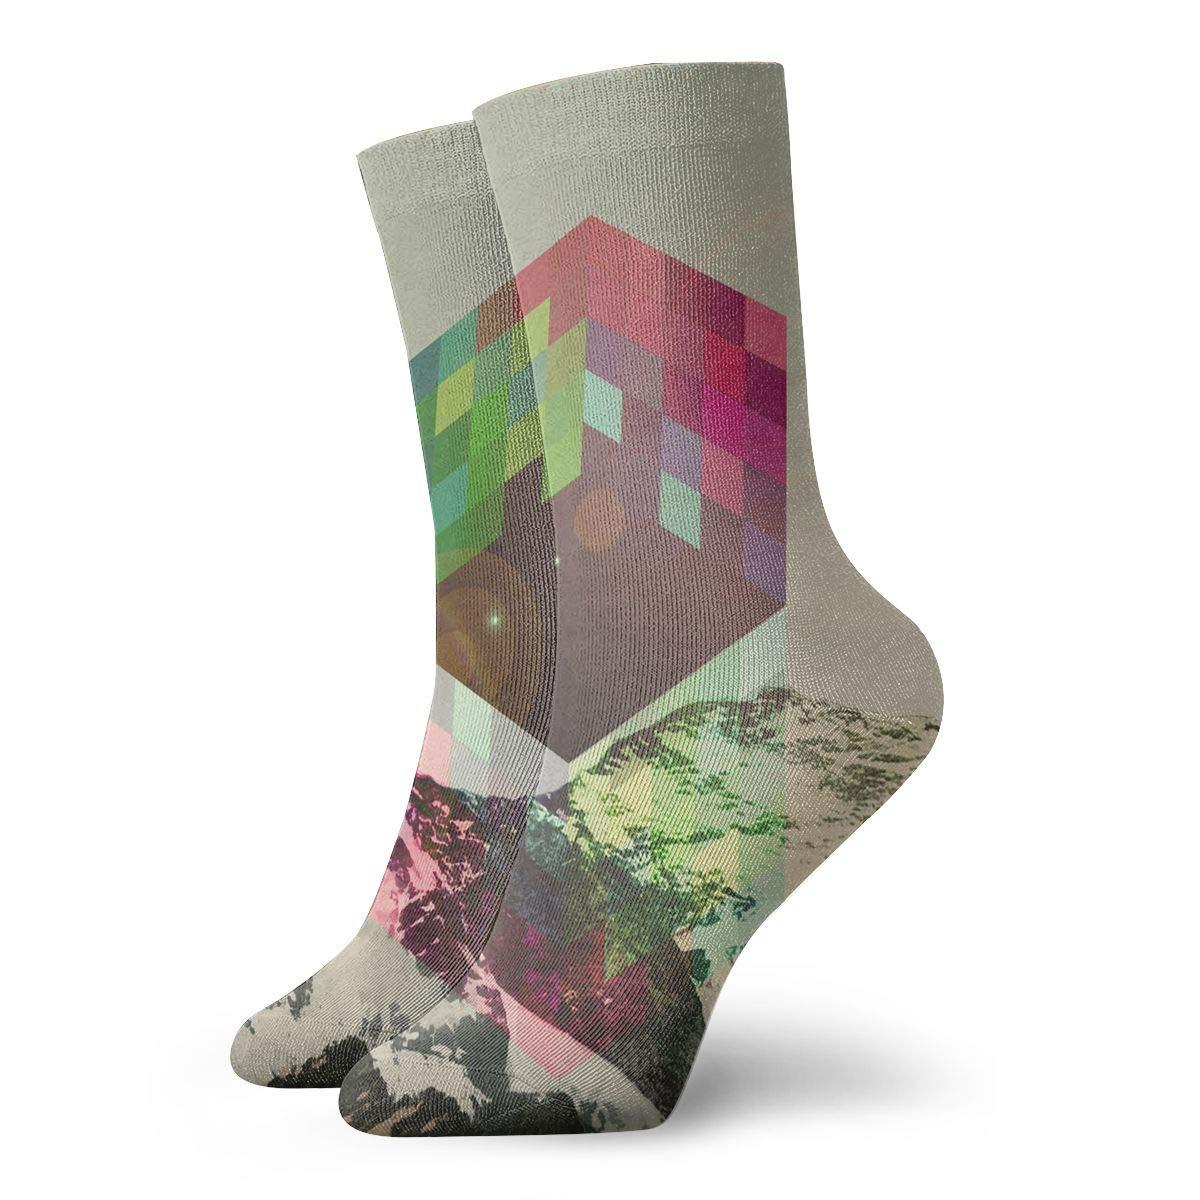 Unisex High Ankle Cushion Crew Socks Magic Cube Pattern Casual Sport Socks